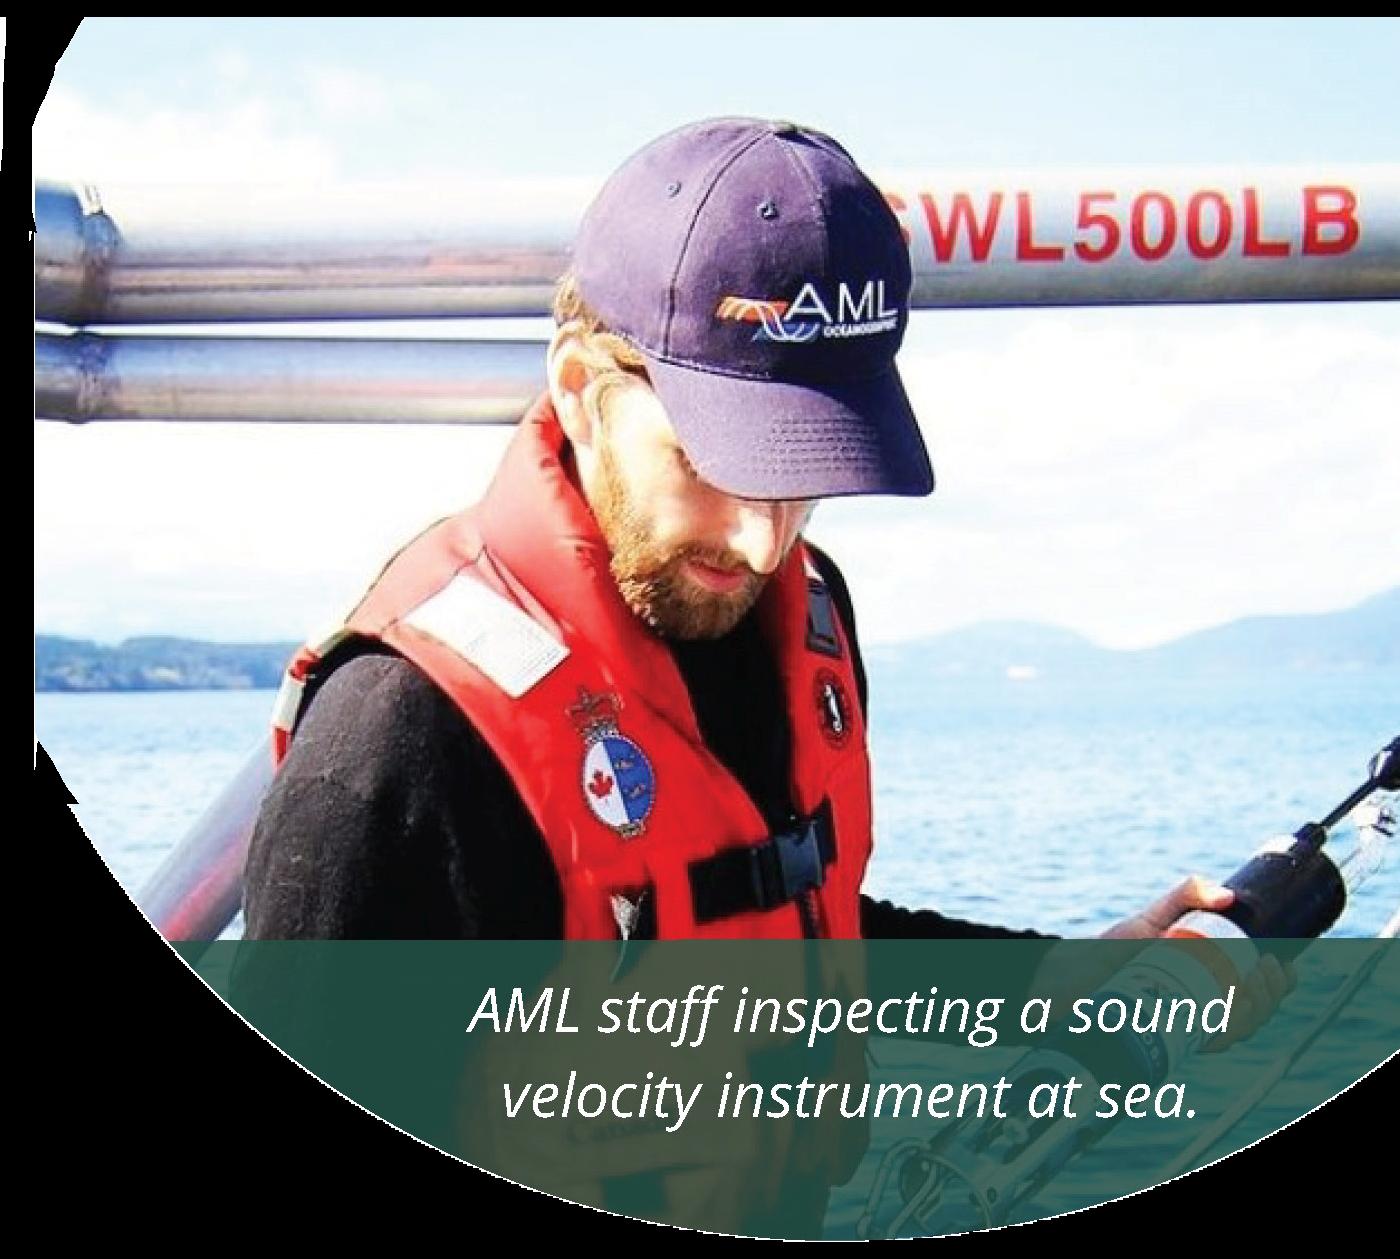 AML staff inspecting a sound velocity instrument at sea. Photo courtesy AML Oceanographic